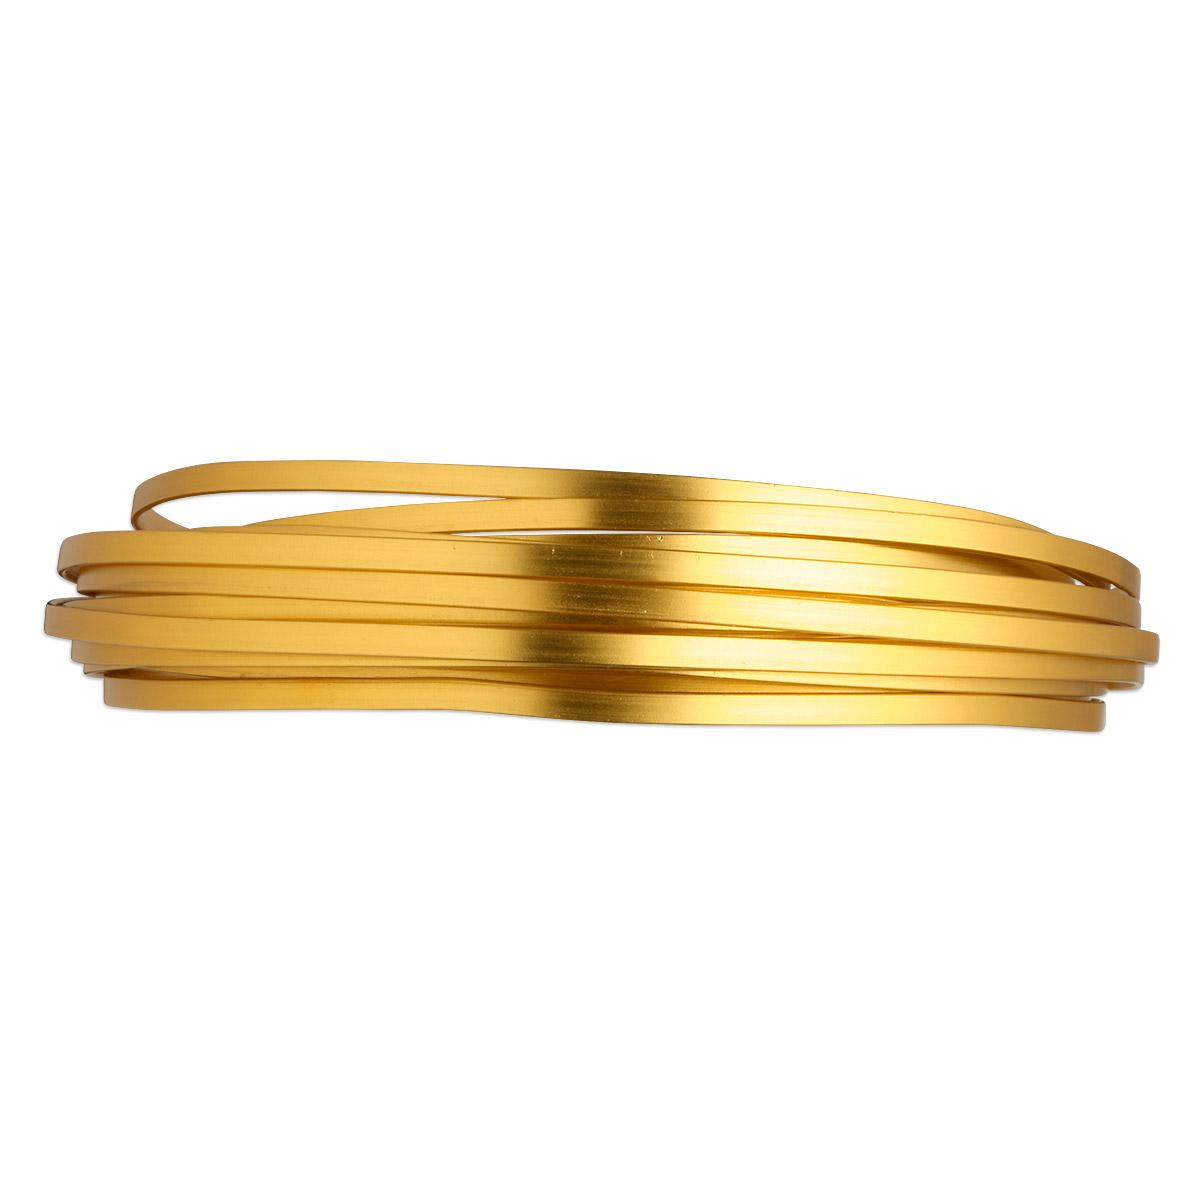 Wire, anodized aluminum, gold, 4x1.2mm flat, 16 gauge. Sold per pkg ...